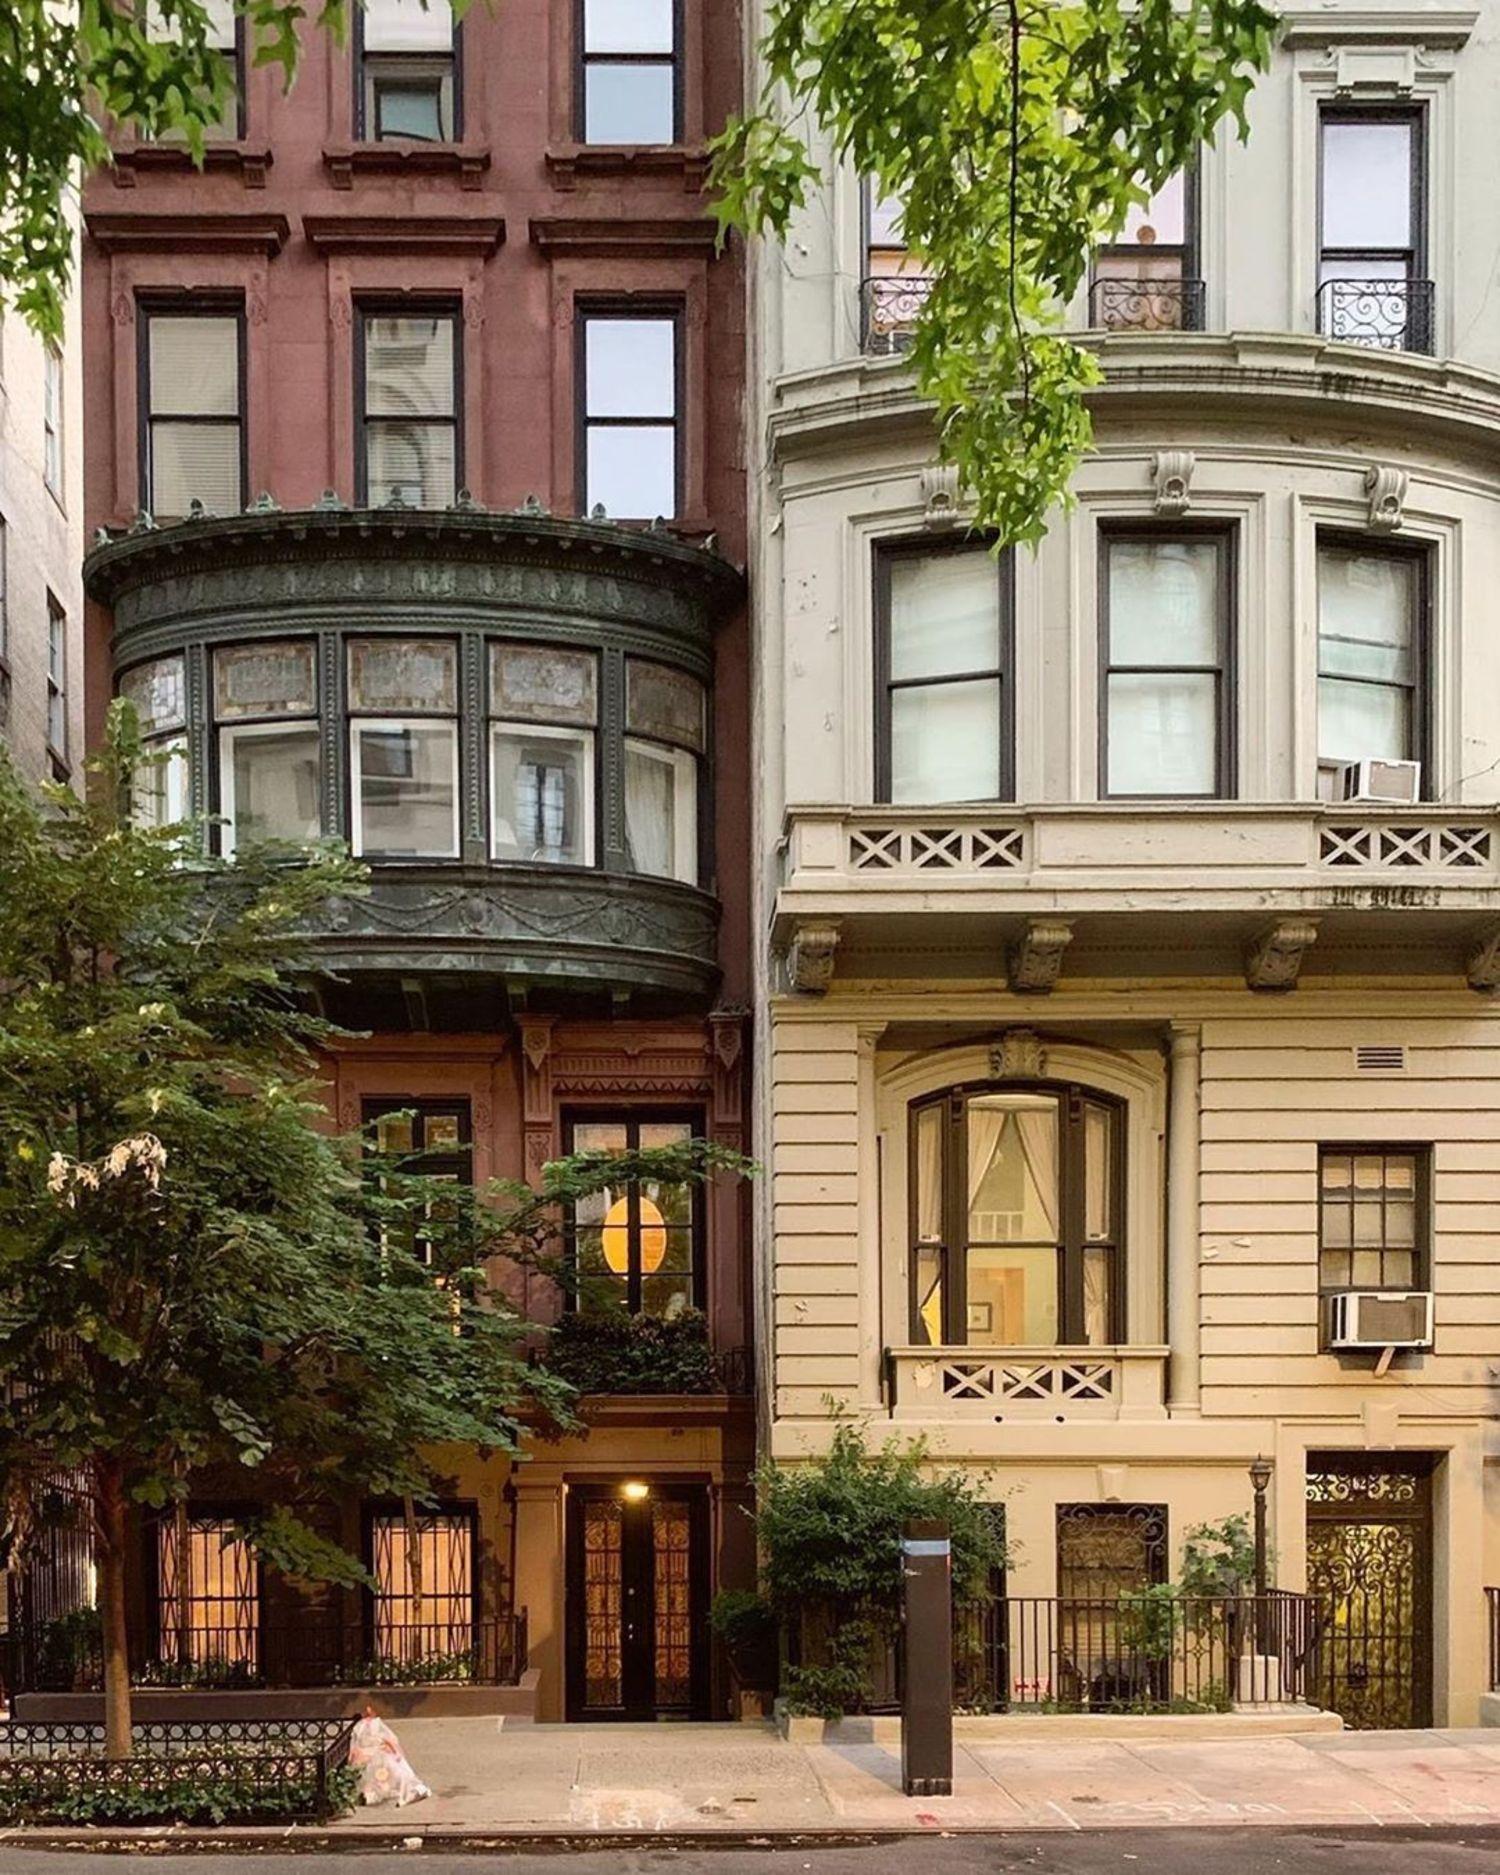 Upper East Side, Manhattan.